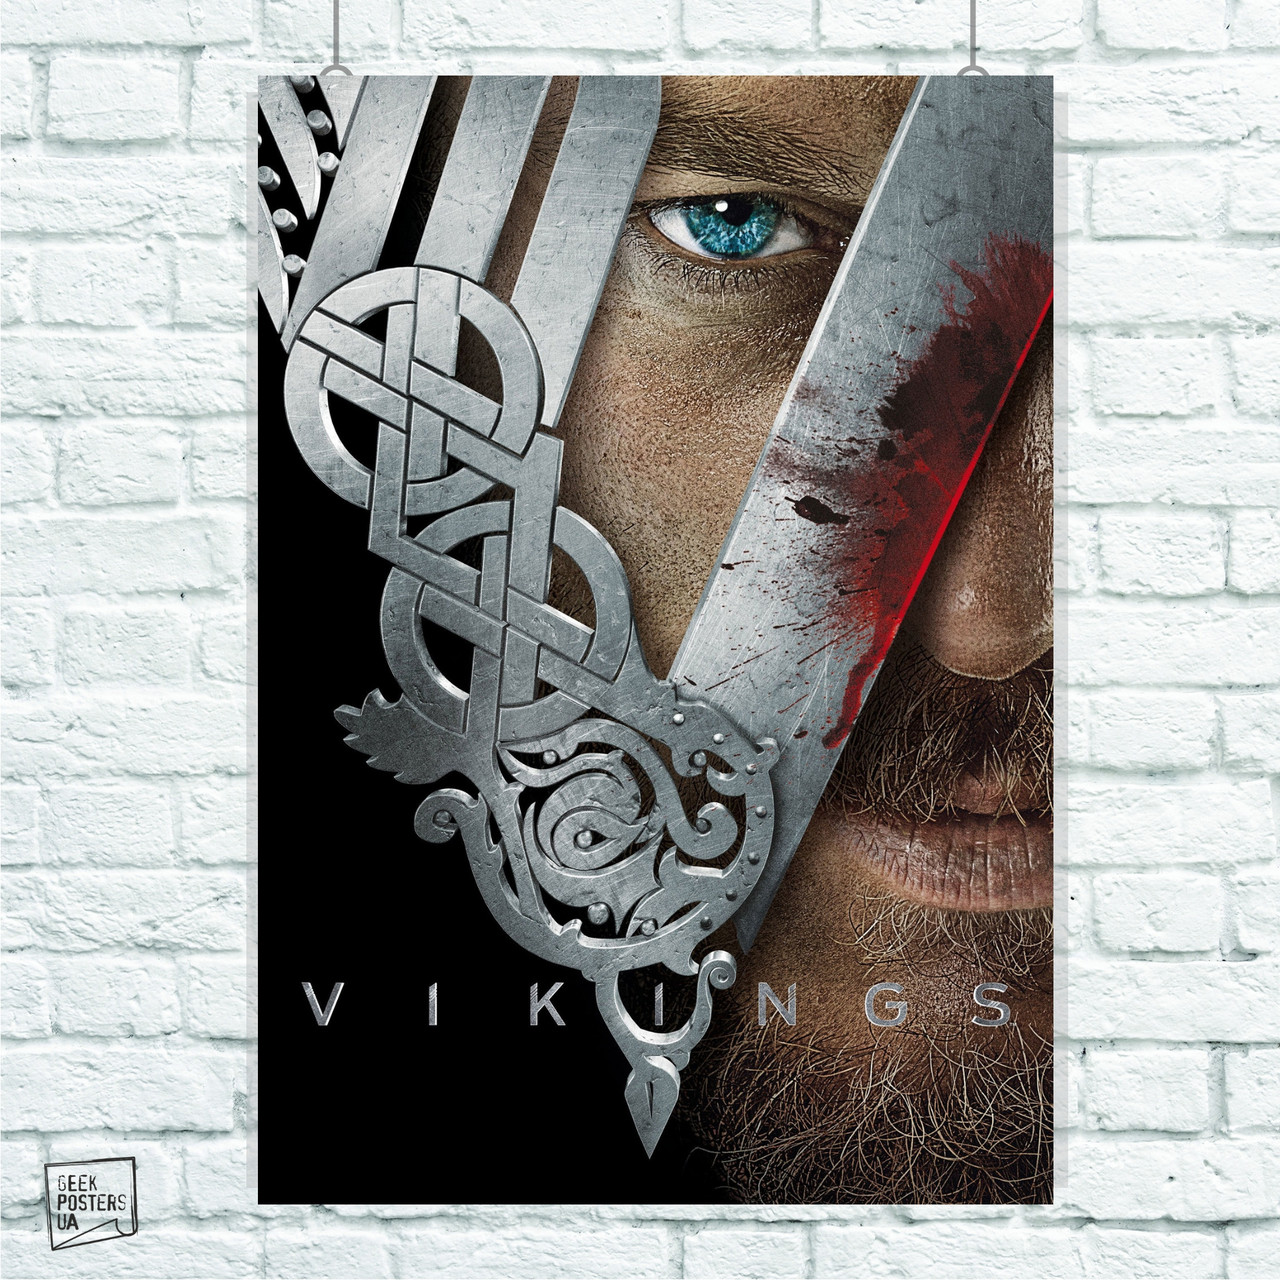 Постер Рагнар и лого. Сериал Викинги, Vikings. Размер 60x42см (A2). Глянцевая бумага